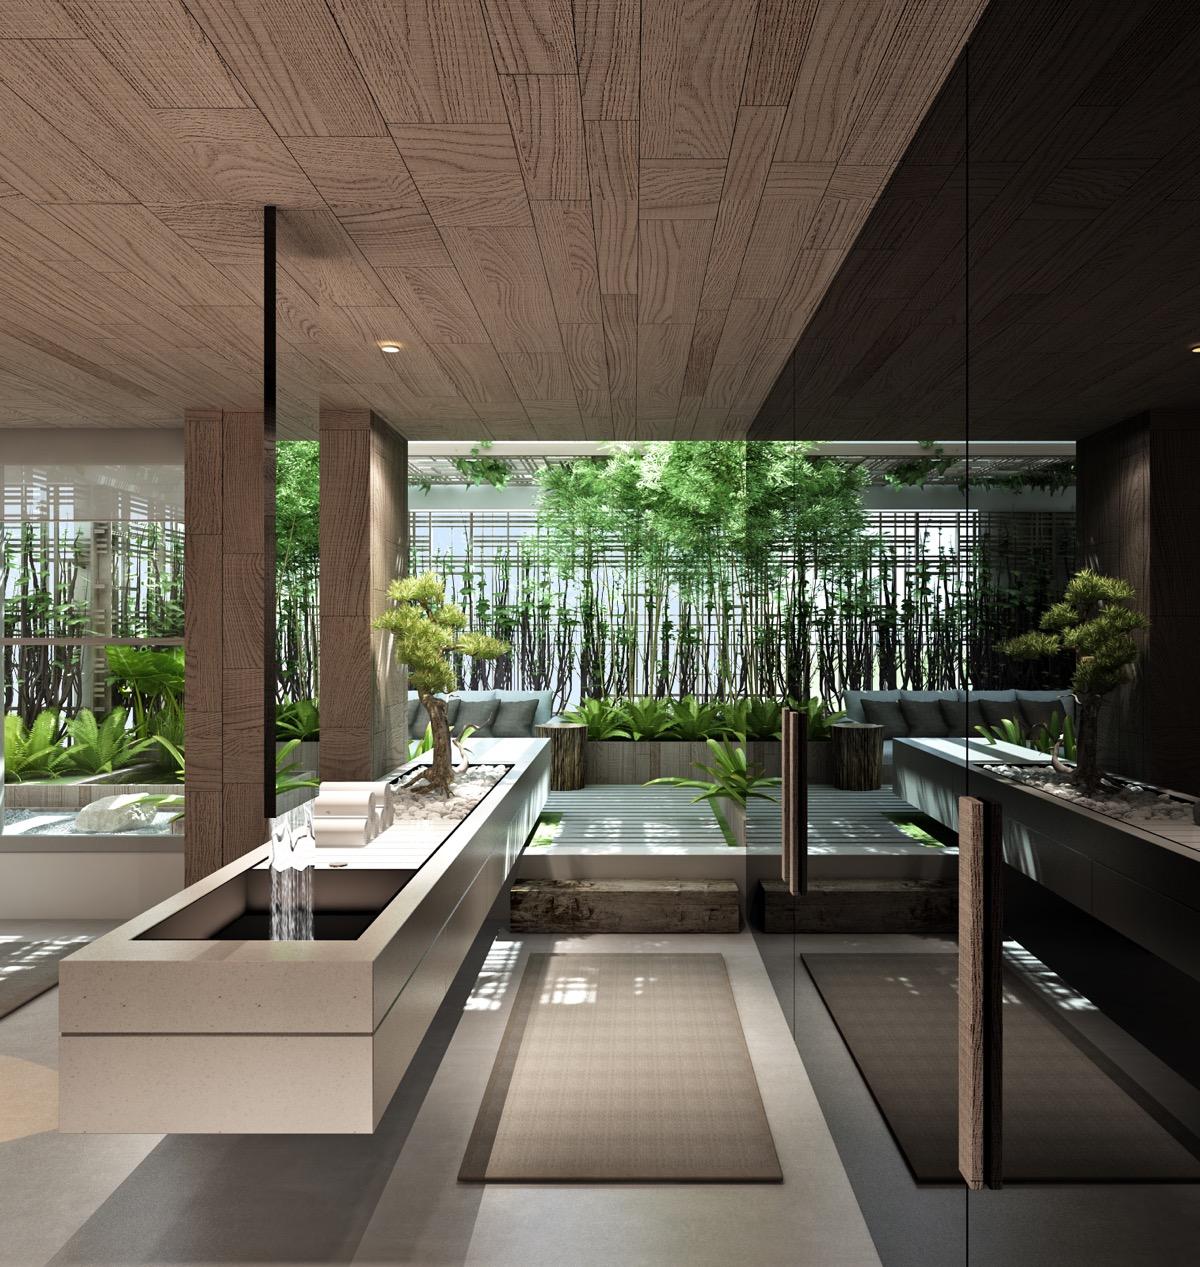 51 Modern Bathroom Design Ideas Plus Tips On How To ... on Contemporary Small Bathroom Ideas  id=13857